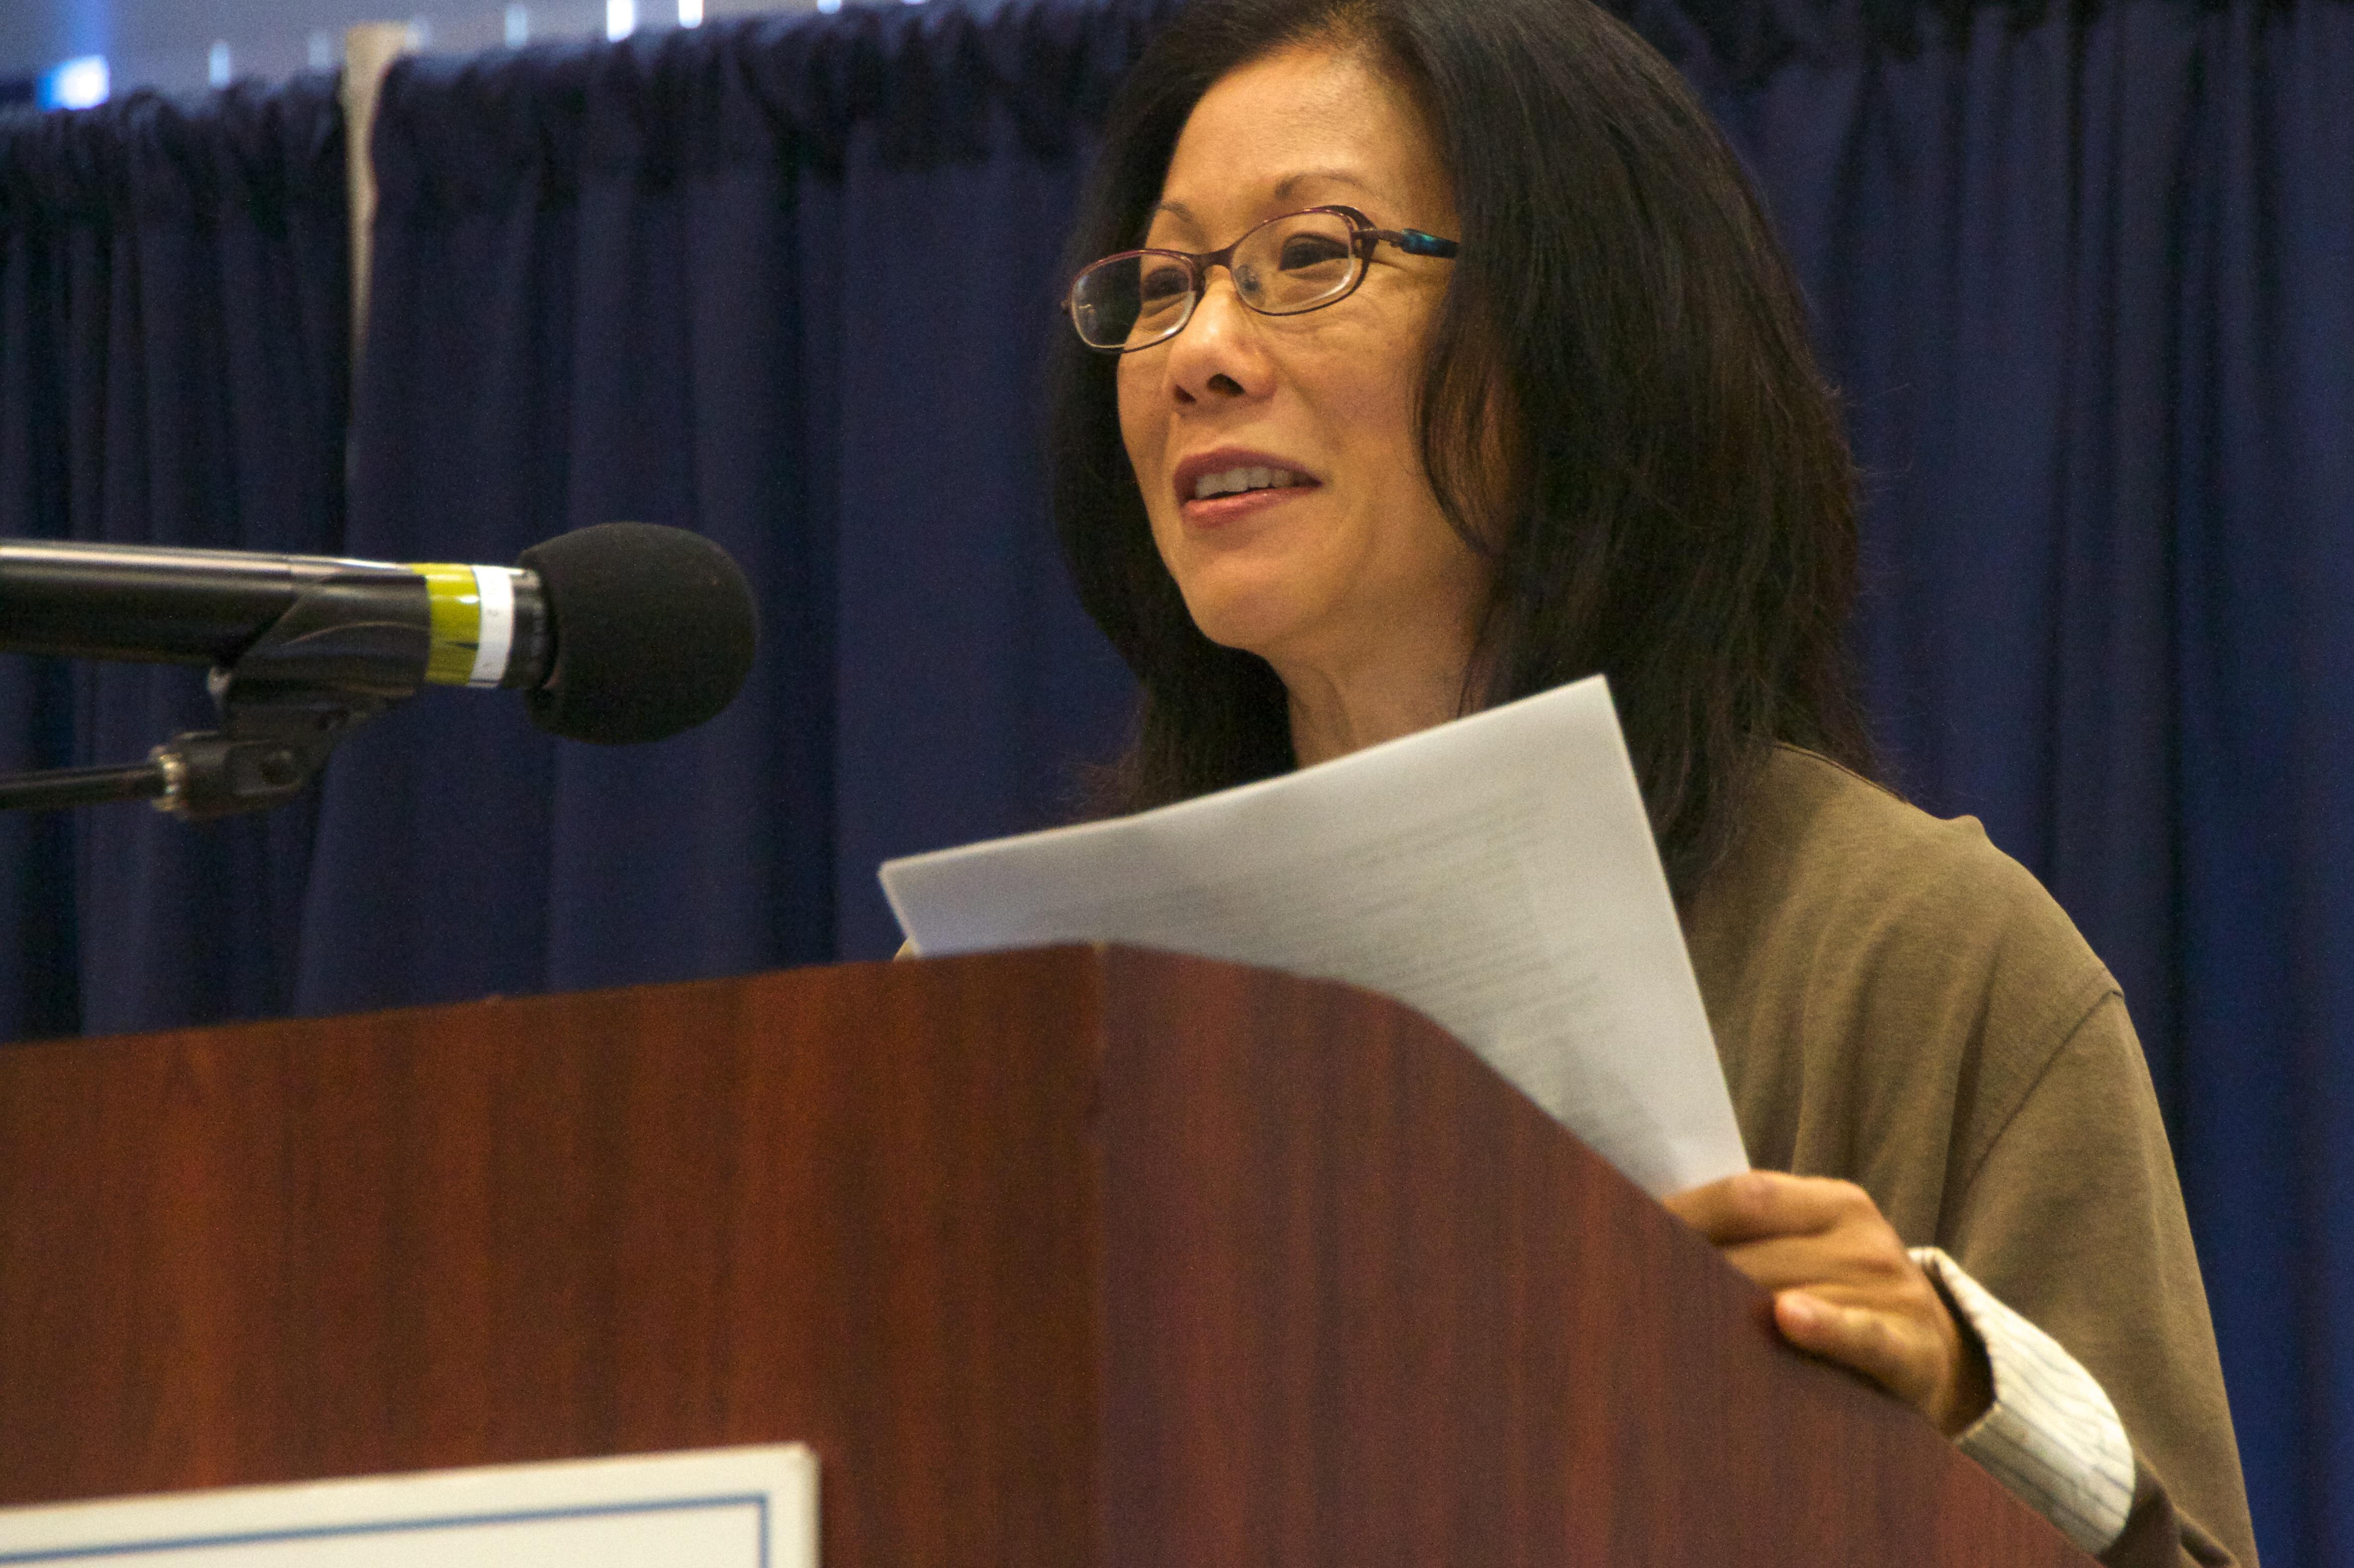 public speaking speeches free